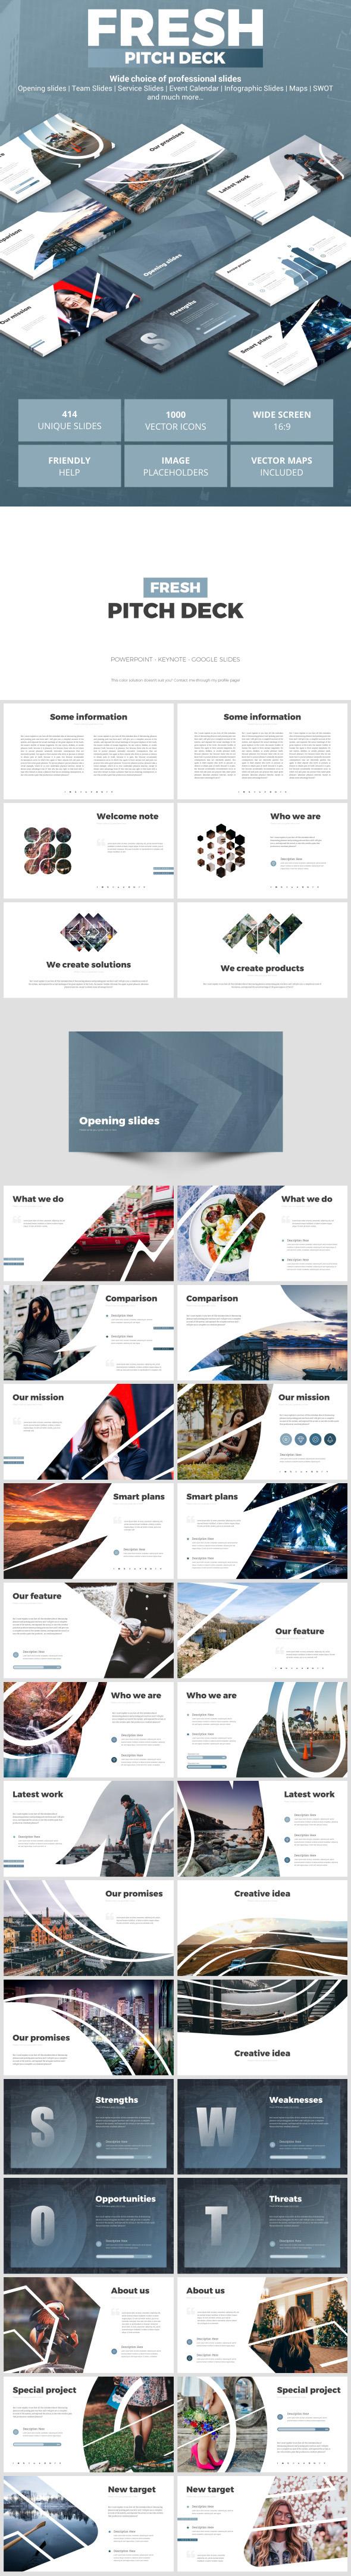 Fresh Pitch Deck - Google Slides Presentation Templates